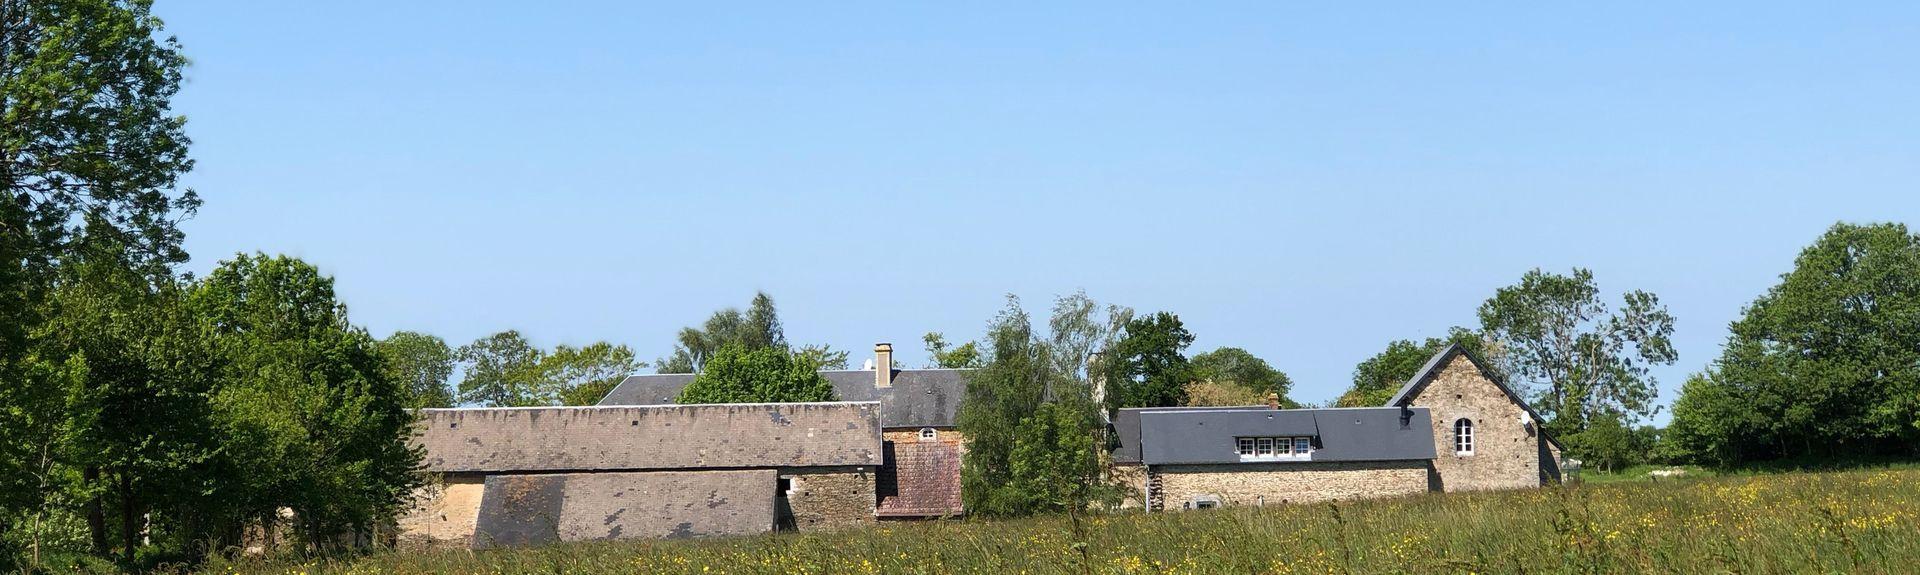 Crouay, Calvados (department), France